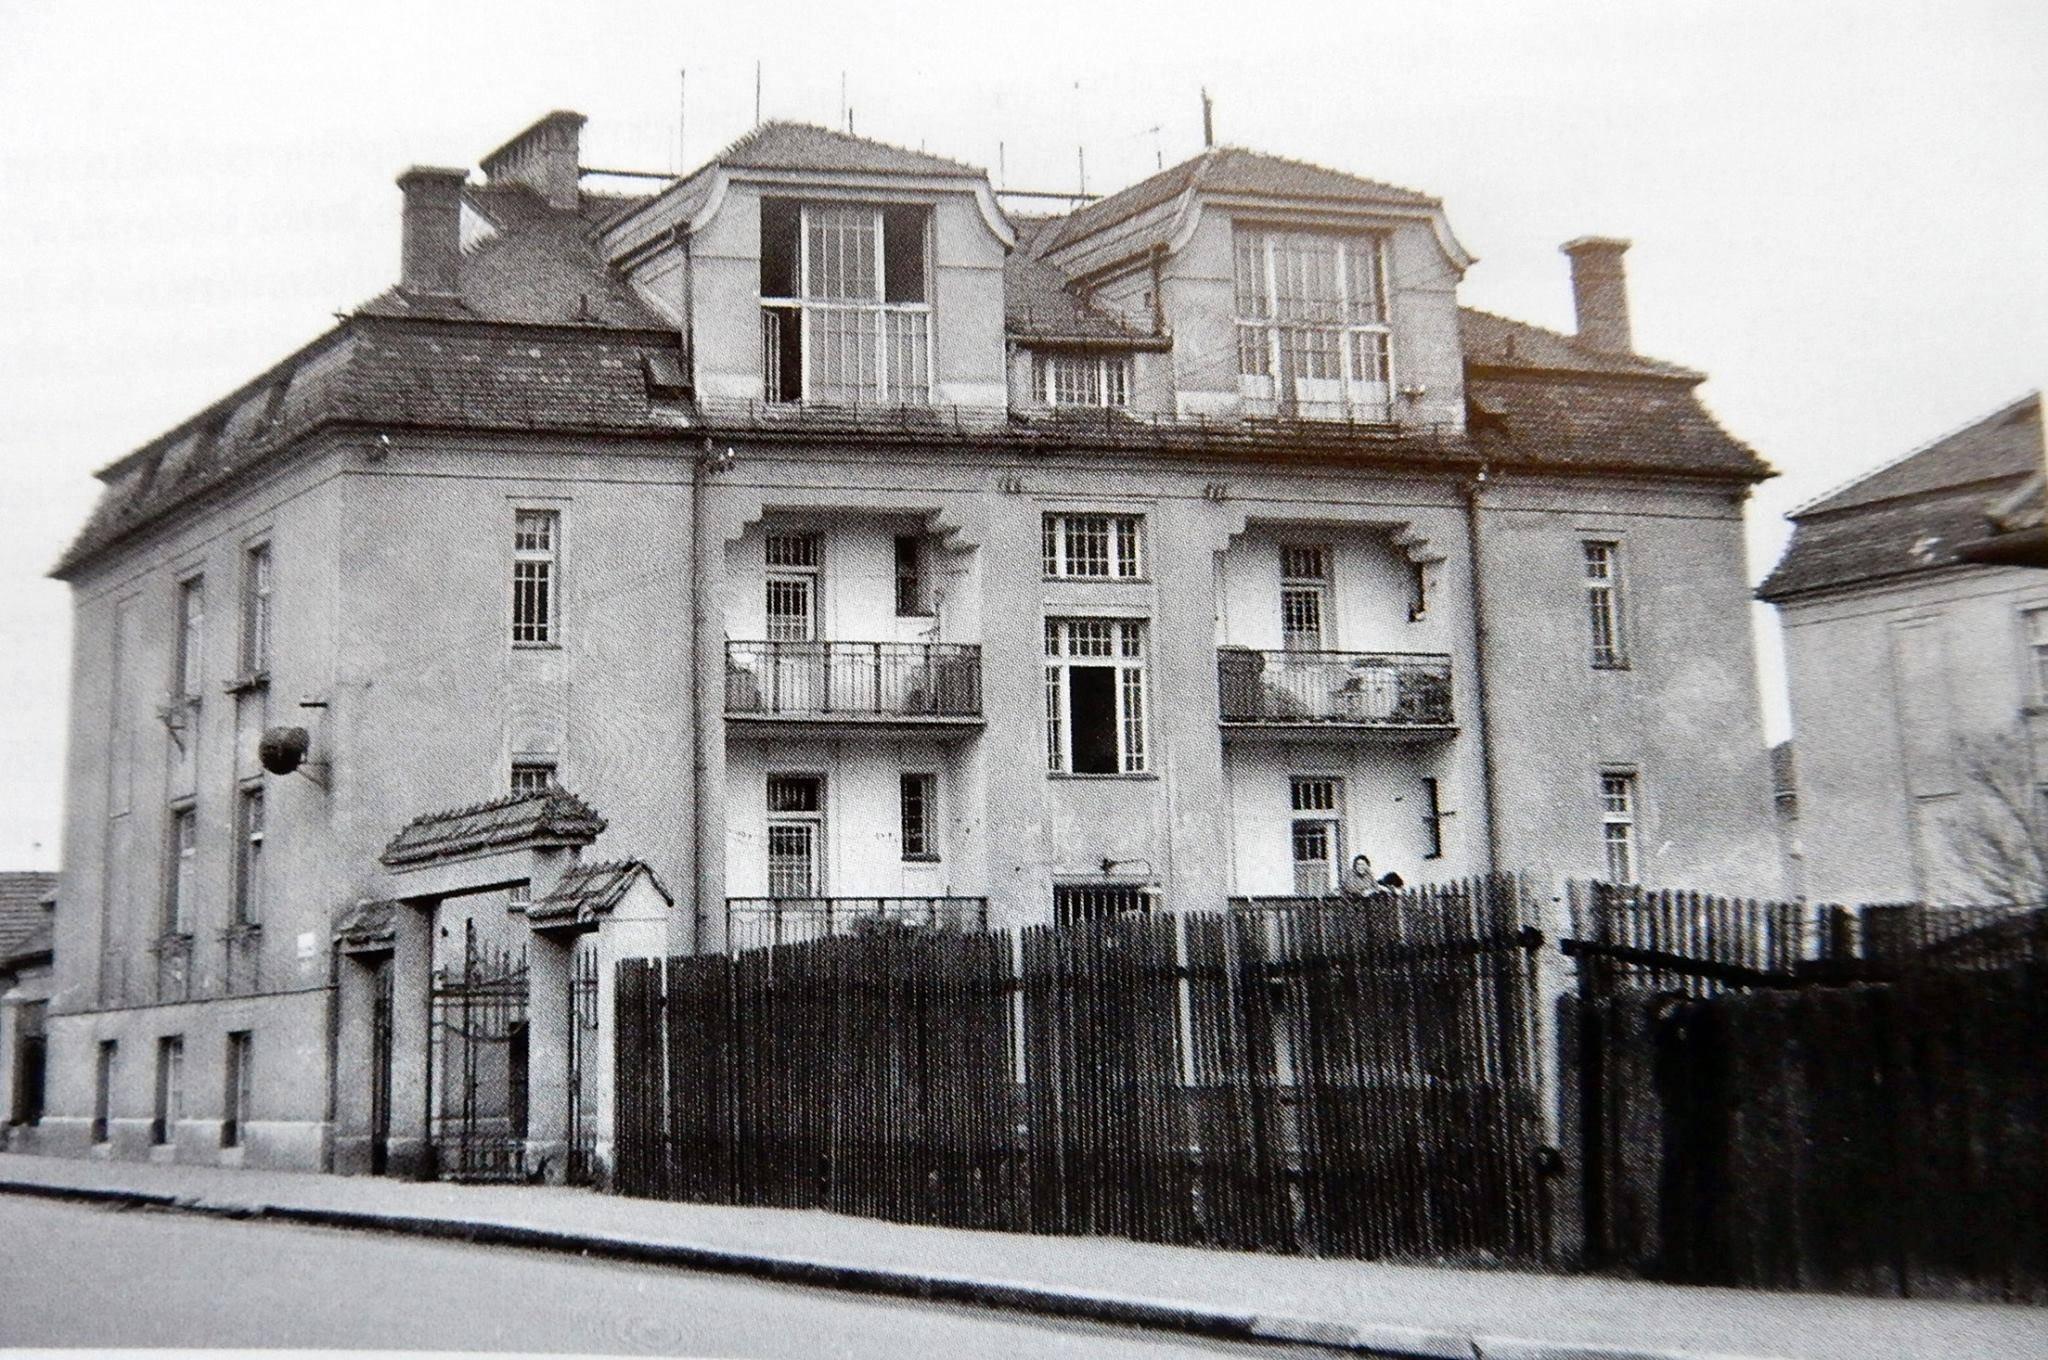 Dom tatra banky, Kuzmanyho, 1965